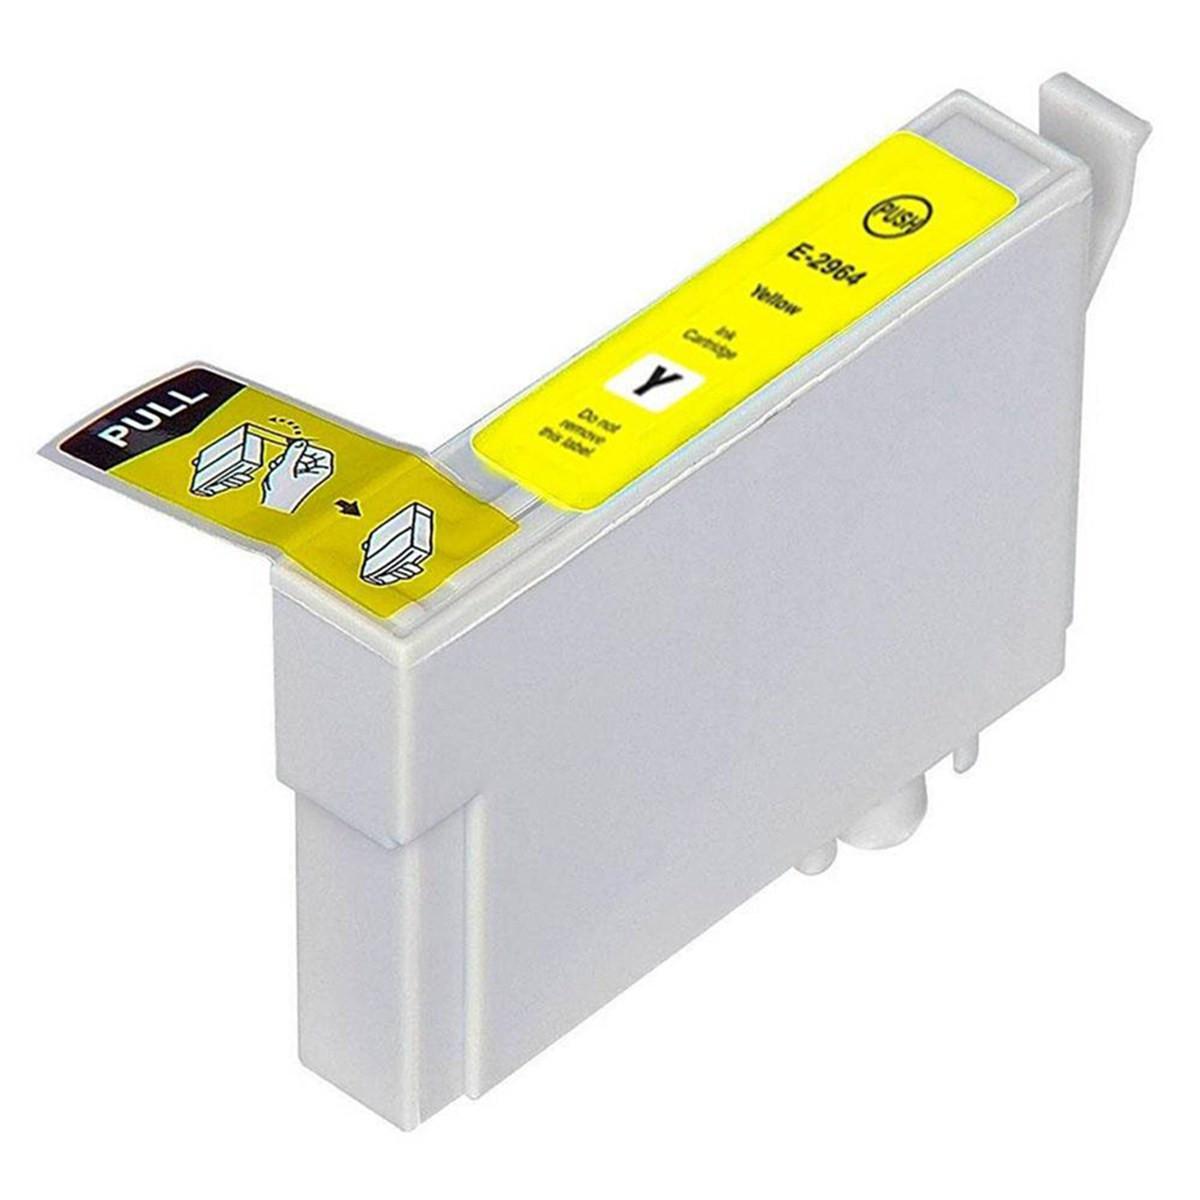 Cartucho de Tinta Compatível com Epson T296420 T296 Amarelo | XP-441 XP-431 XP-241 | 13ml